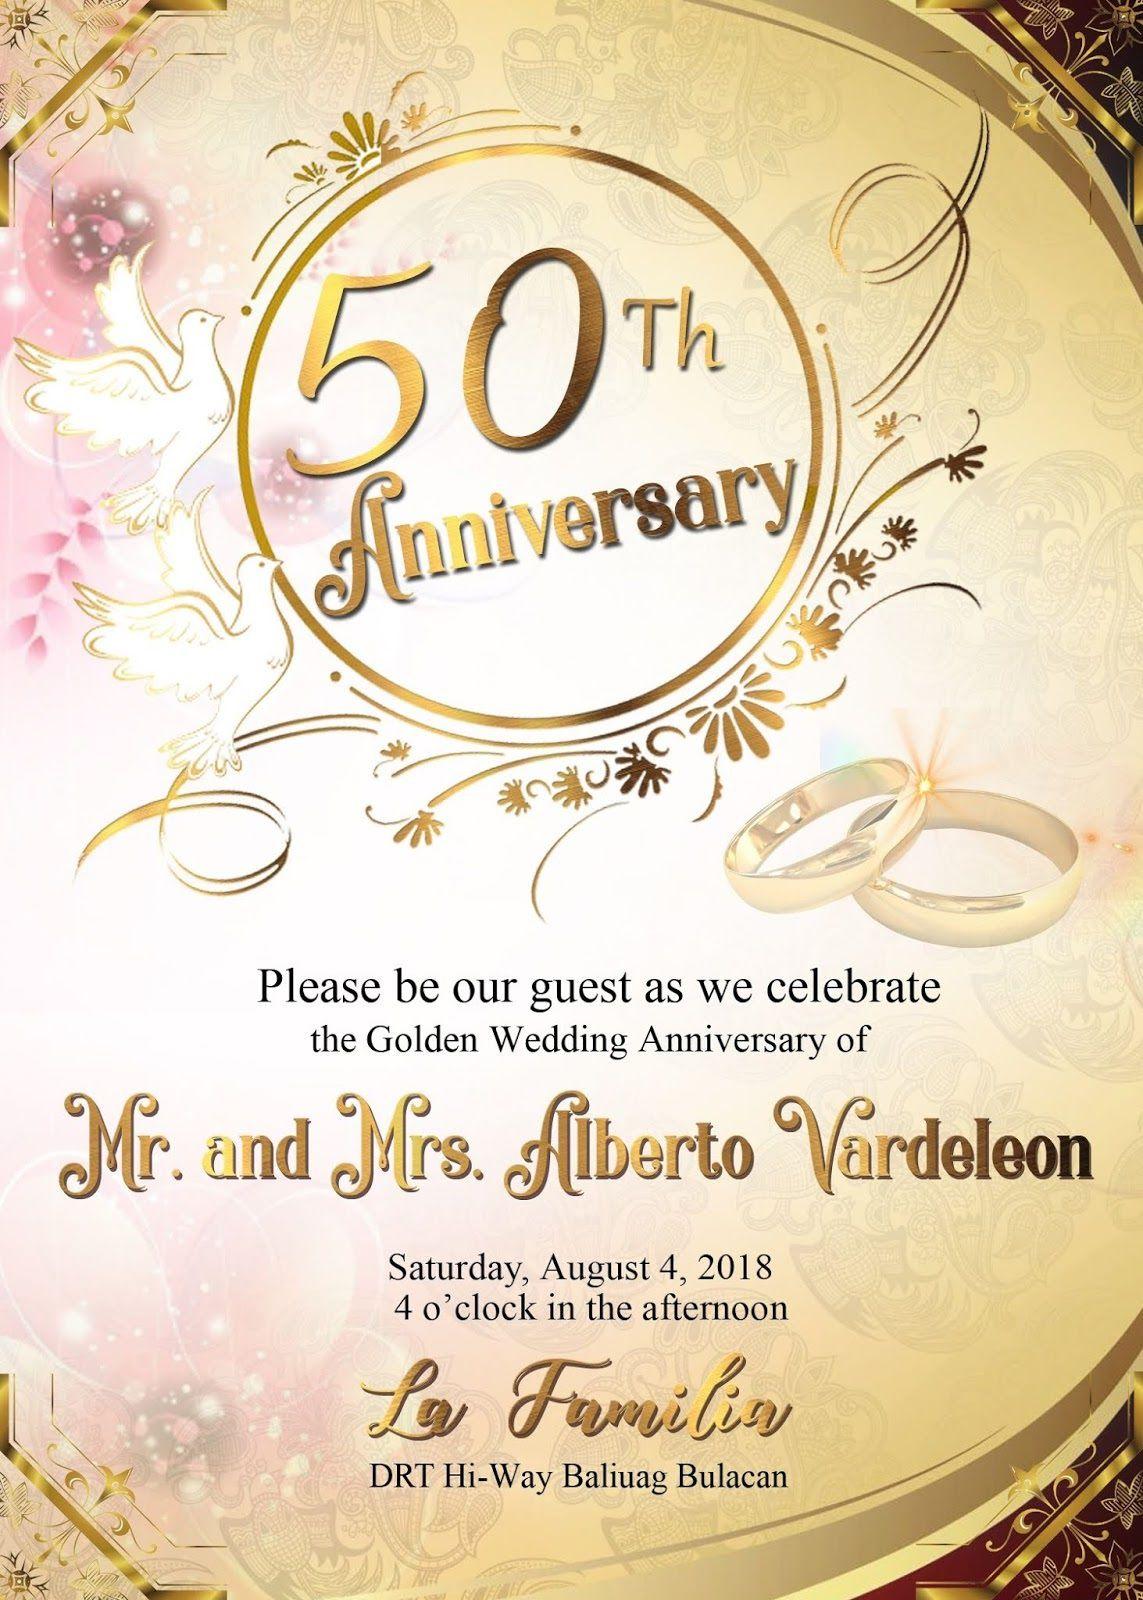 008 Impressive 50th Wedding Anniversary Invitation Template Concept  Templates Card Sample GoldenFull